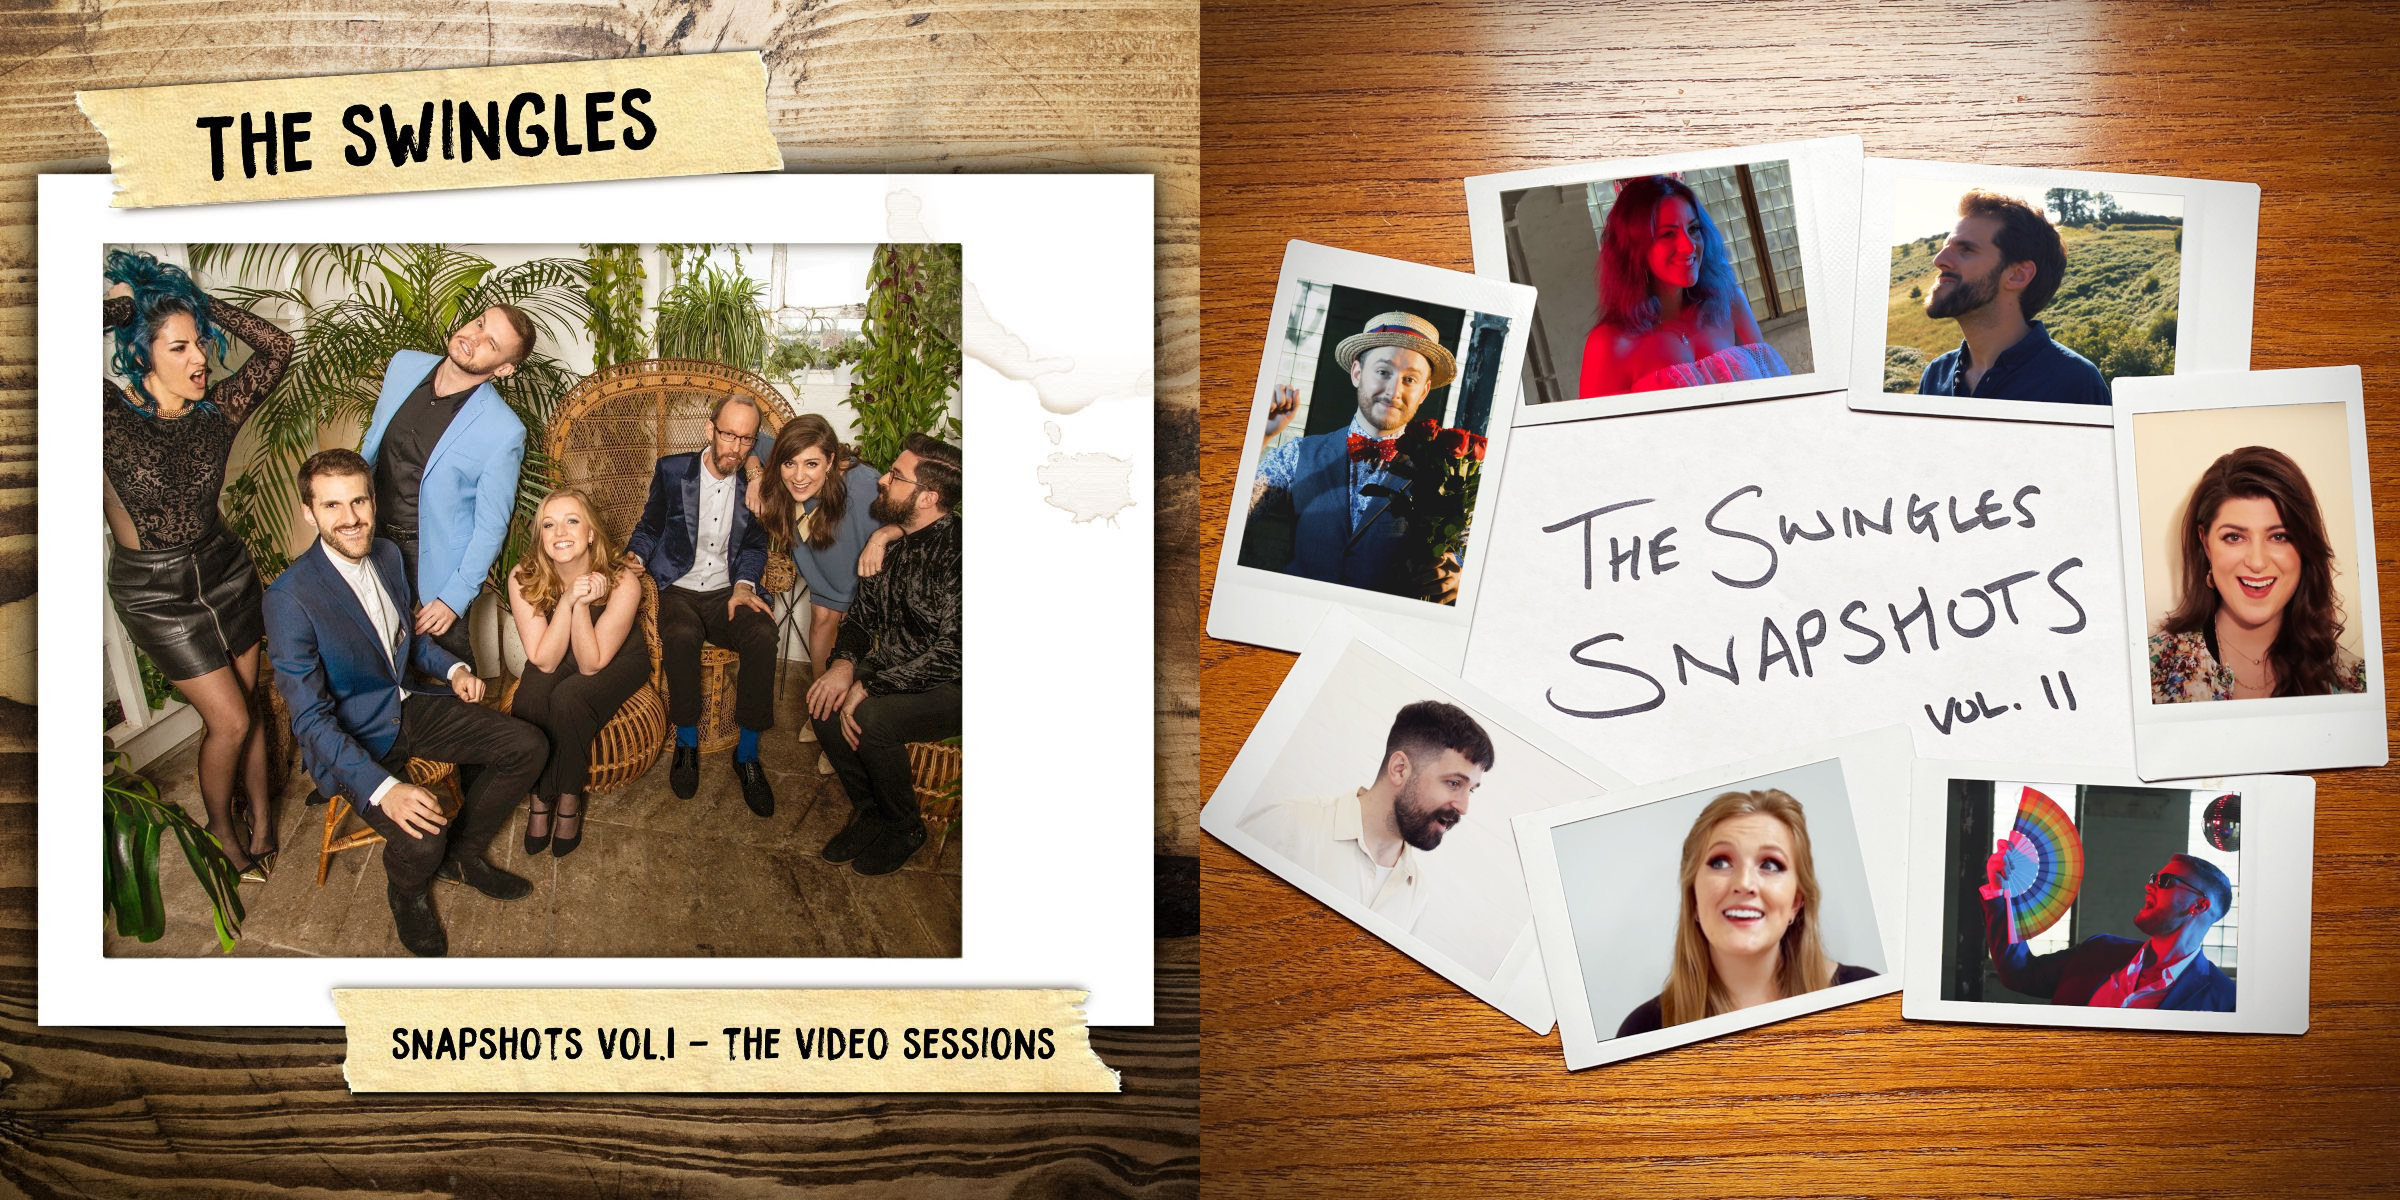 The Swingles: Snapshots Vol. I & II